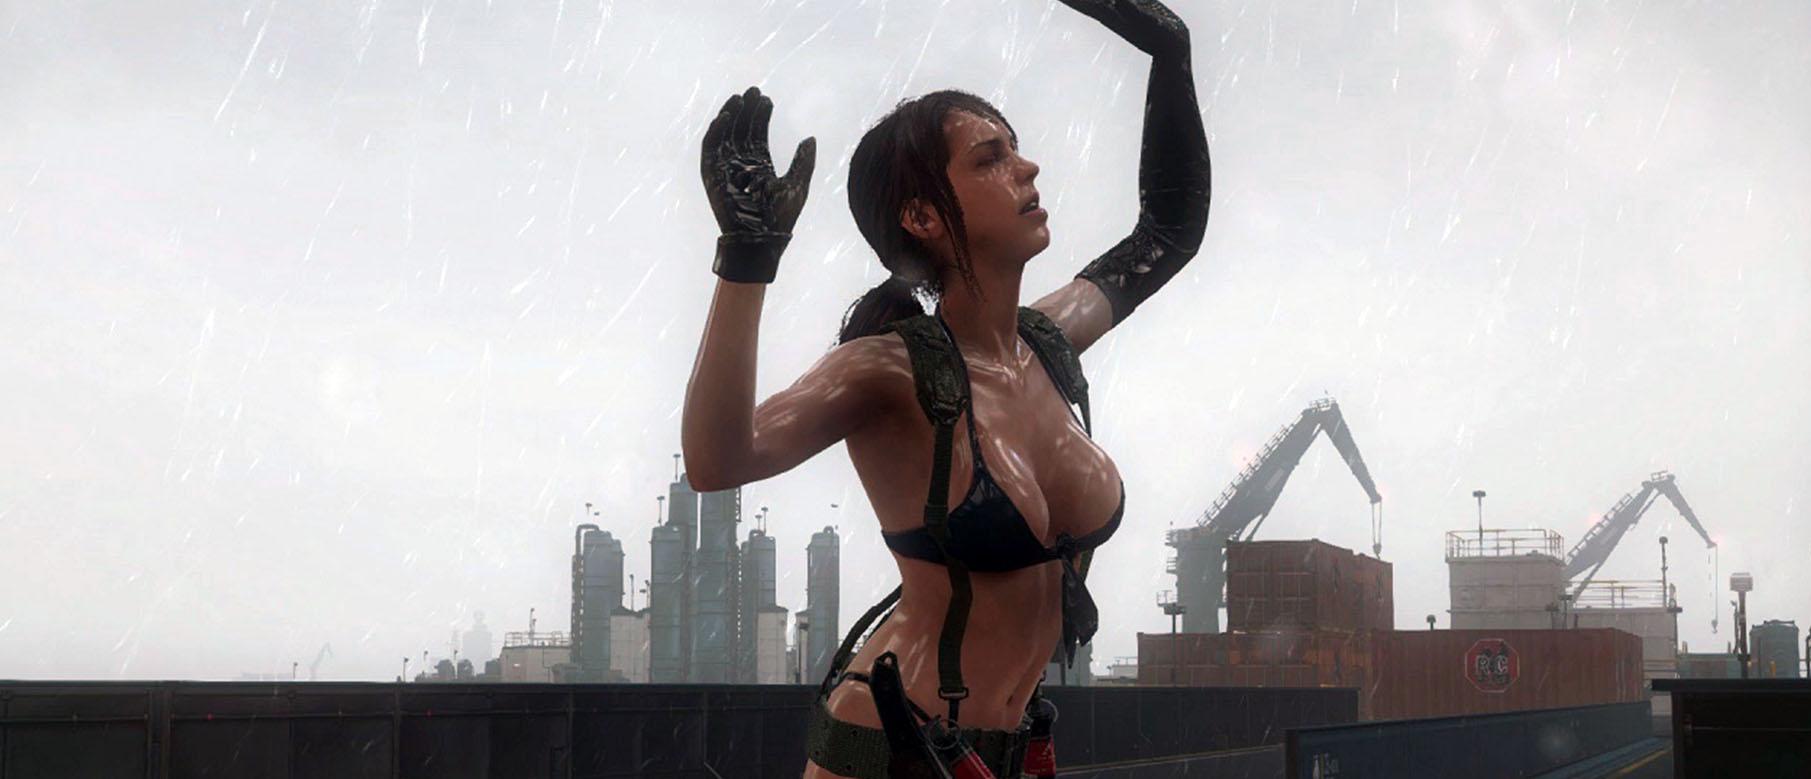 Metal Gear Solid V: The Phantom Pain - Сцена с Тихоней под дождем :: Rampaga